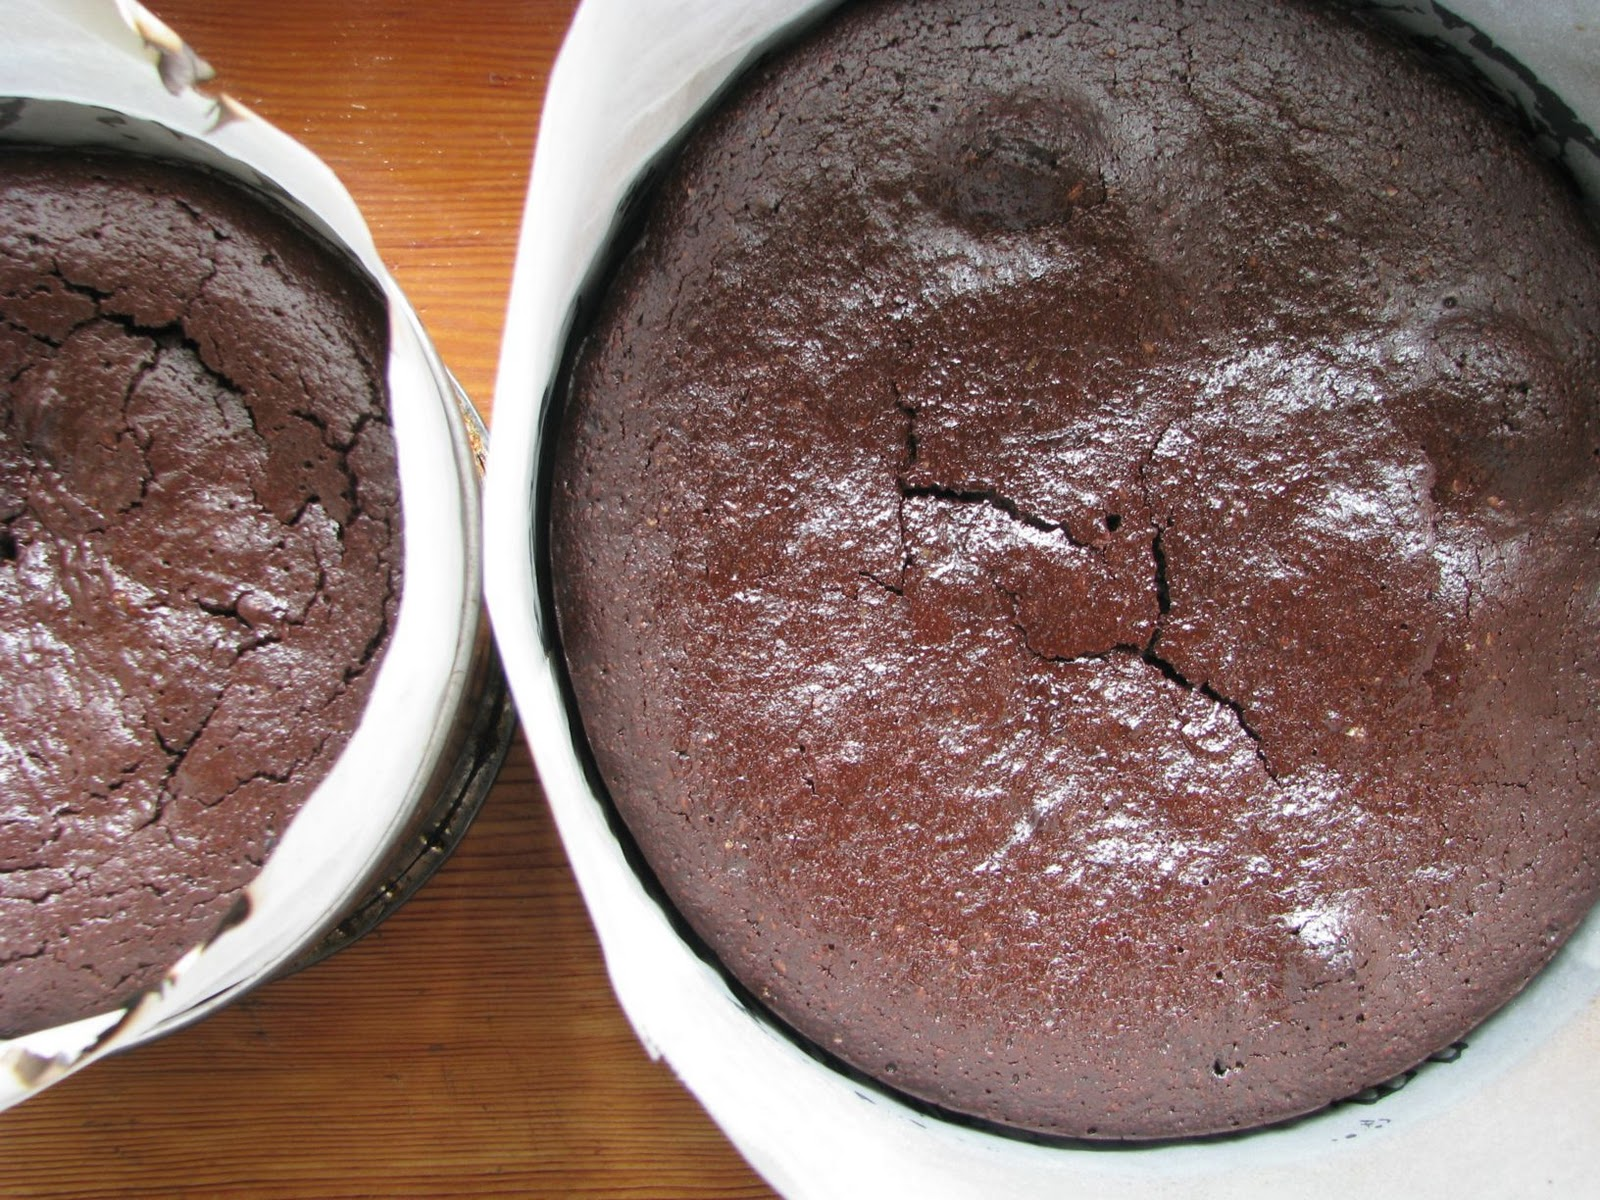 gluten free chocolate wedding cake recipe My Darling Lemon Thyme